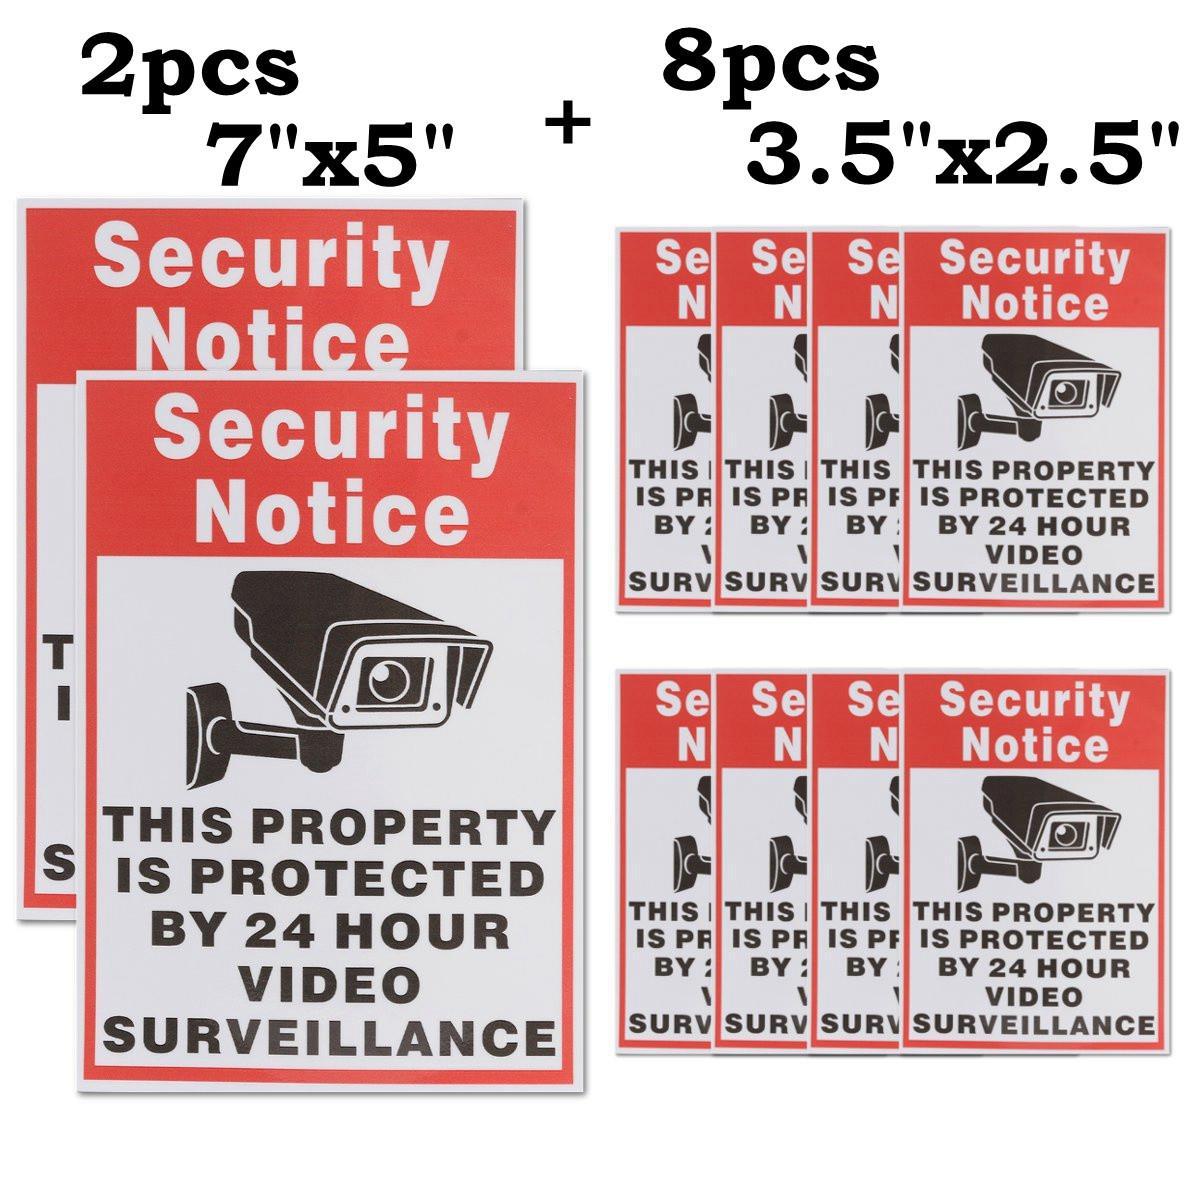 Safurance 10pcs/lot Waterproof Sunscreen PVC Home CCTV Video Surveillance Security Camera Alarm Sticker Warning Decal Signs